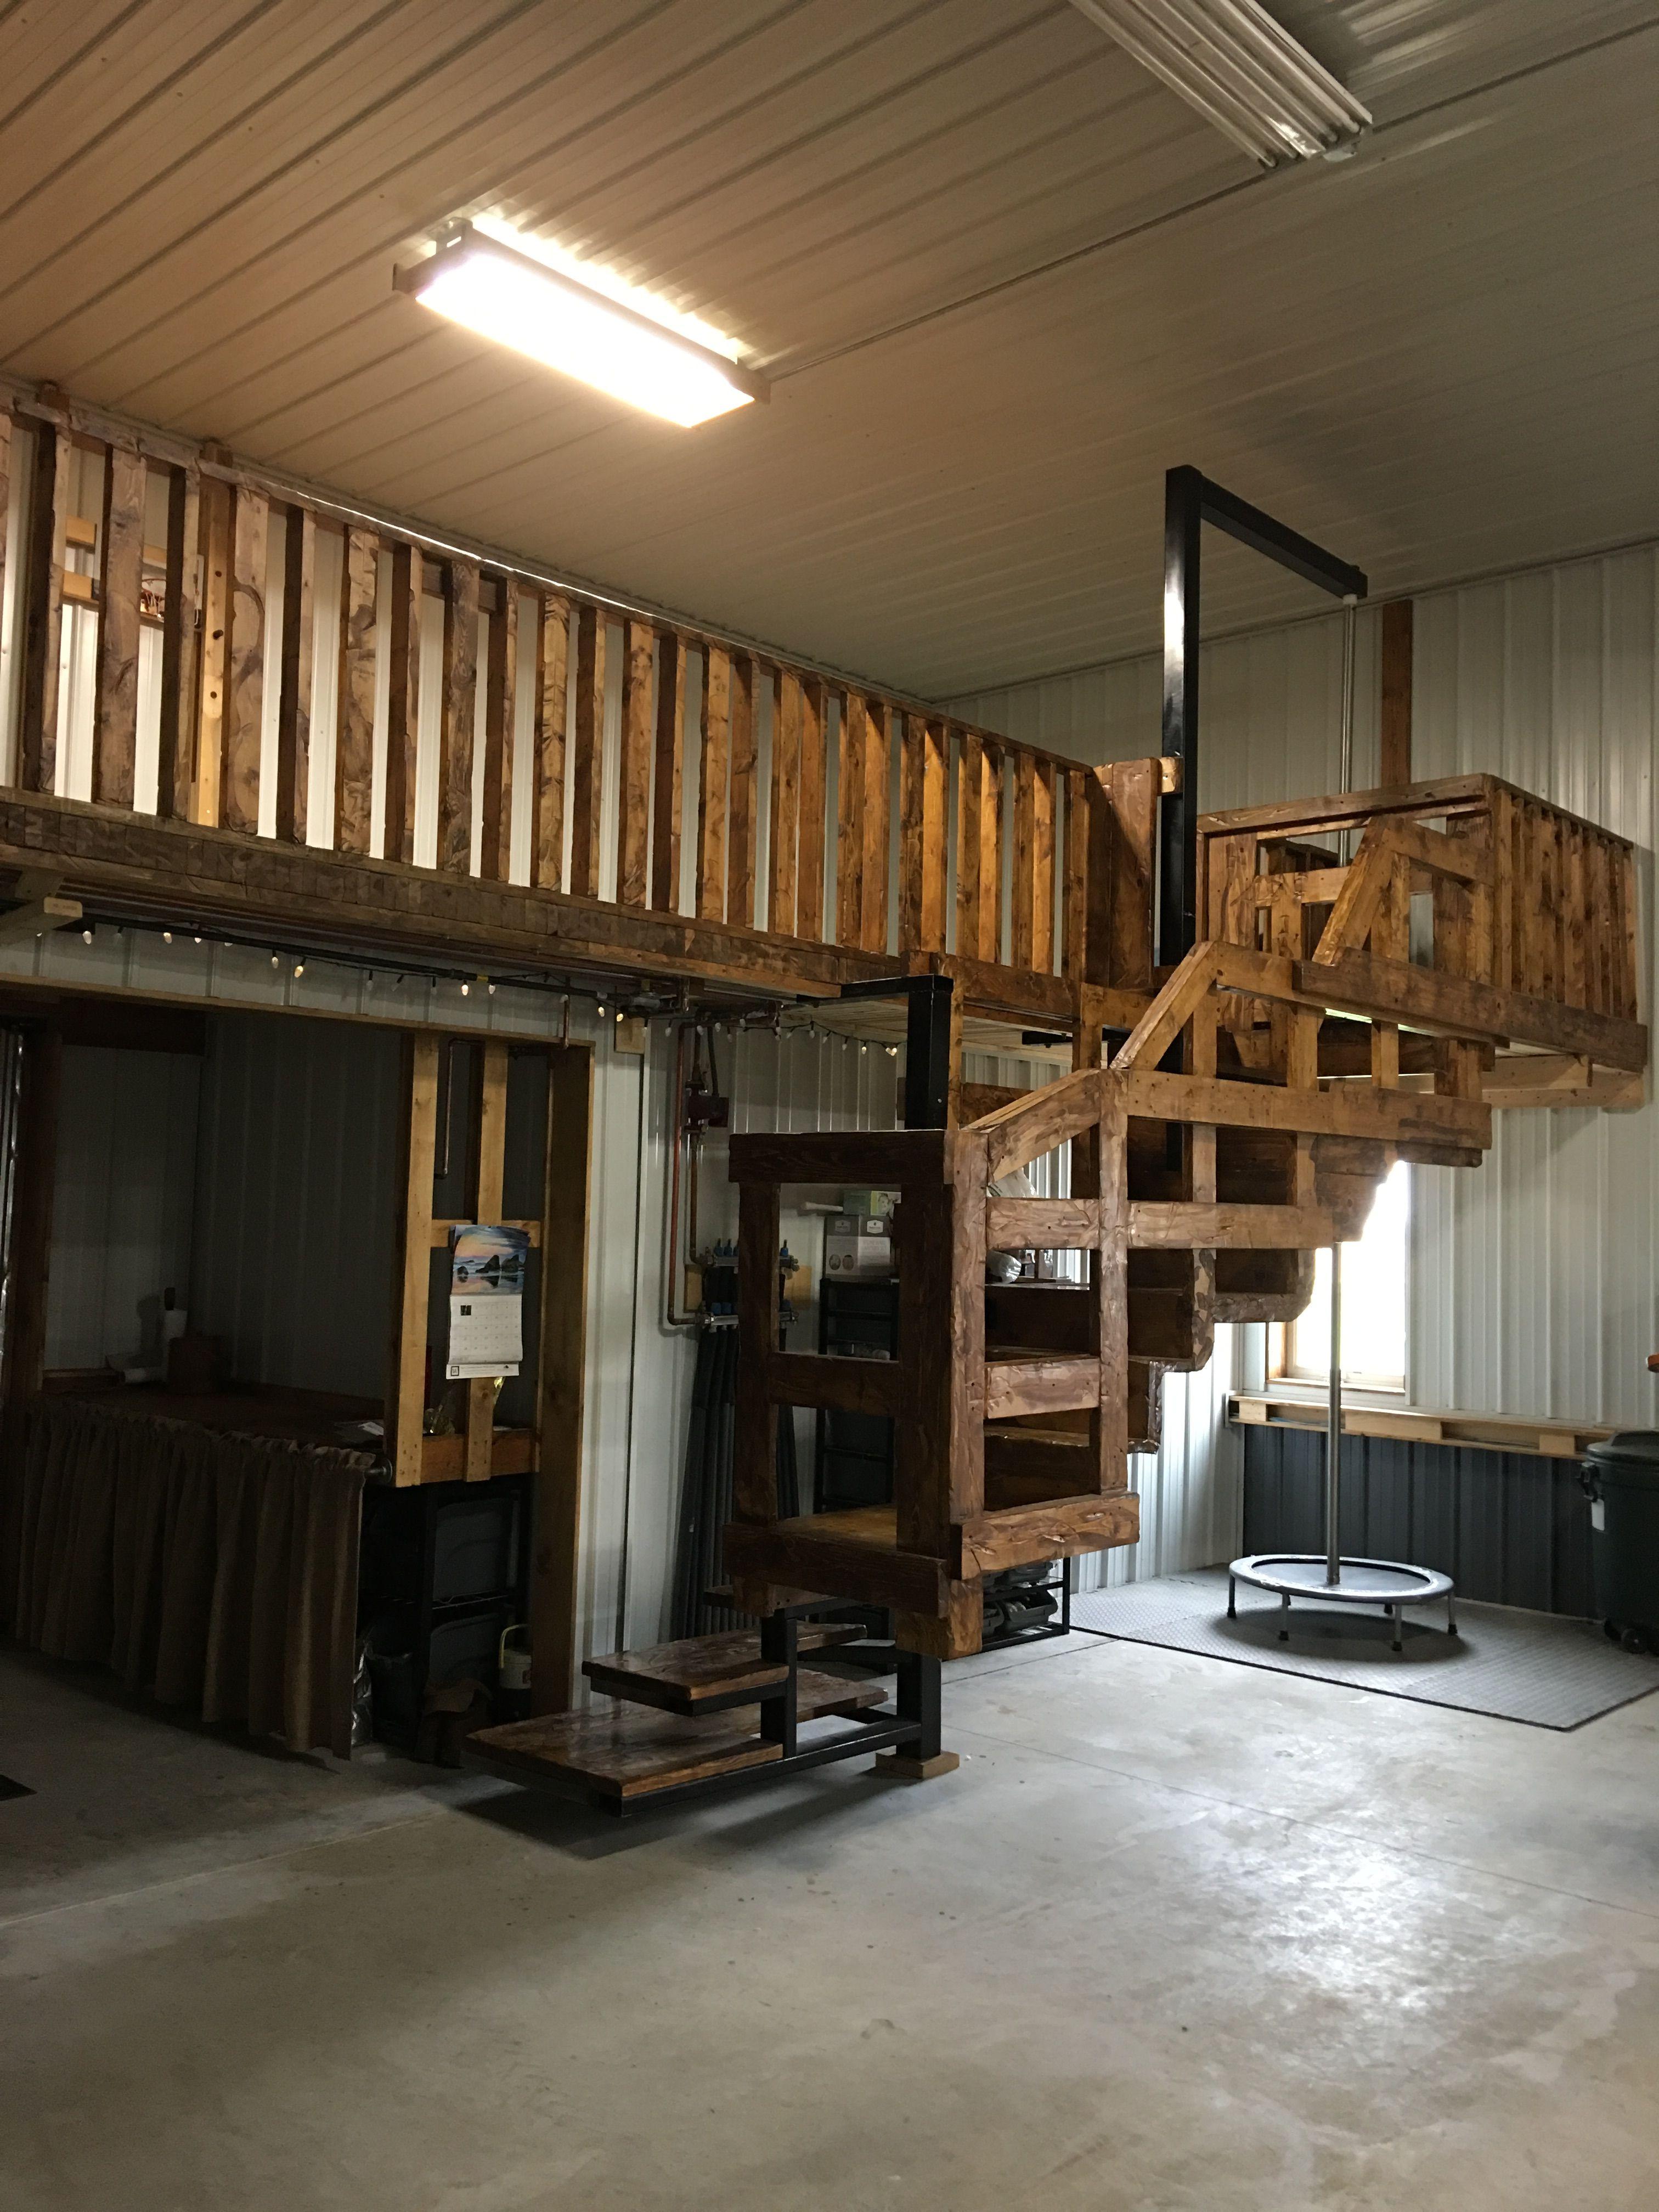 3 Car Garage Apartment